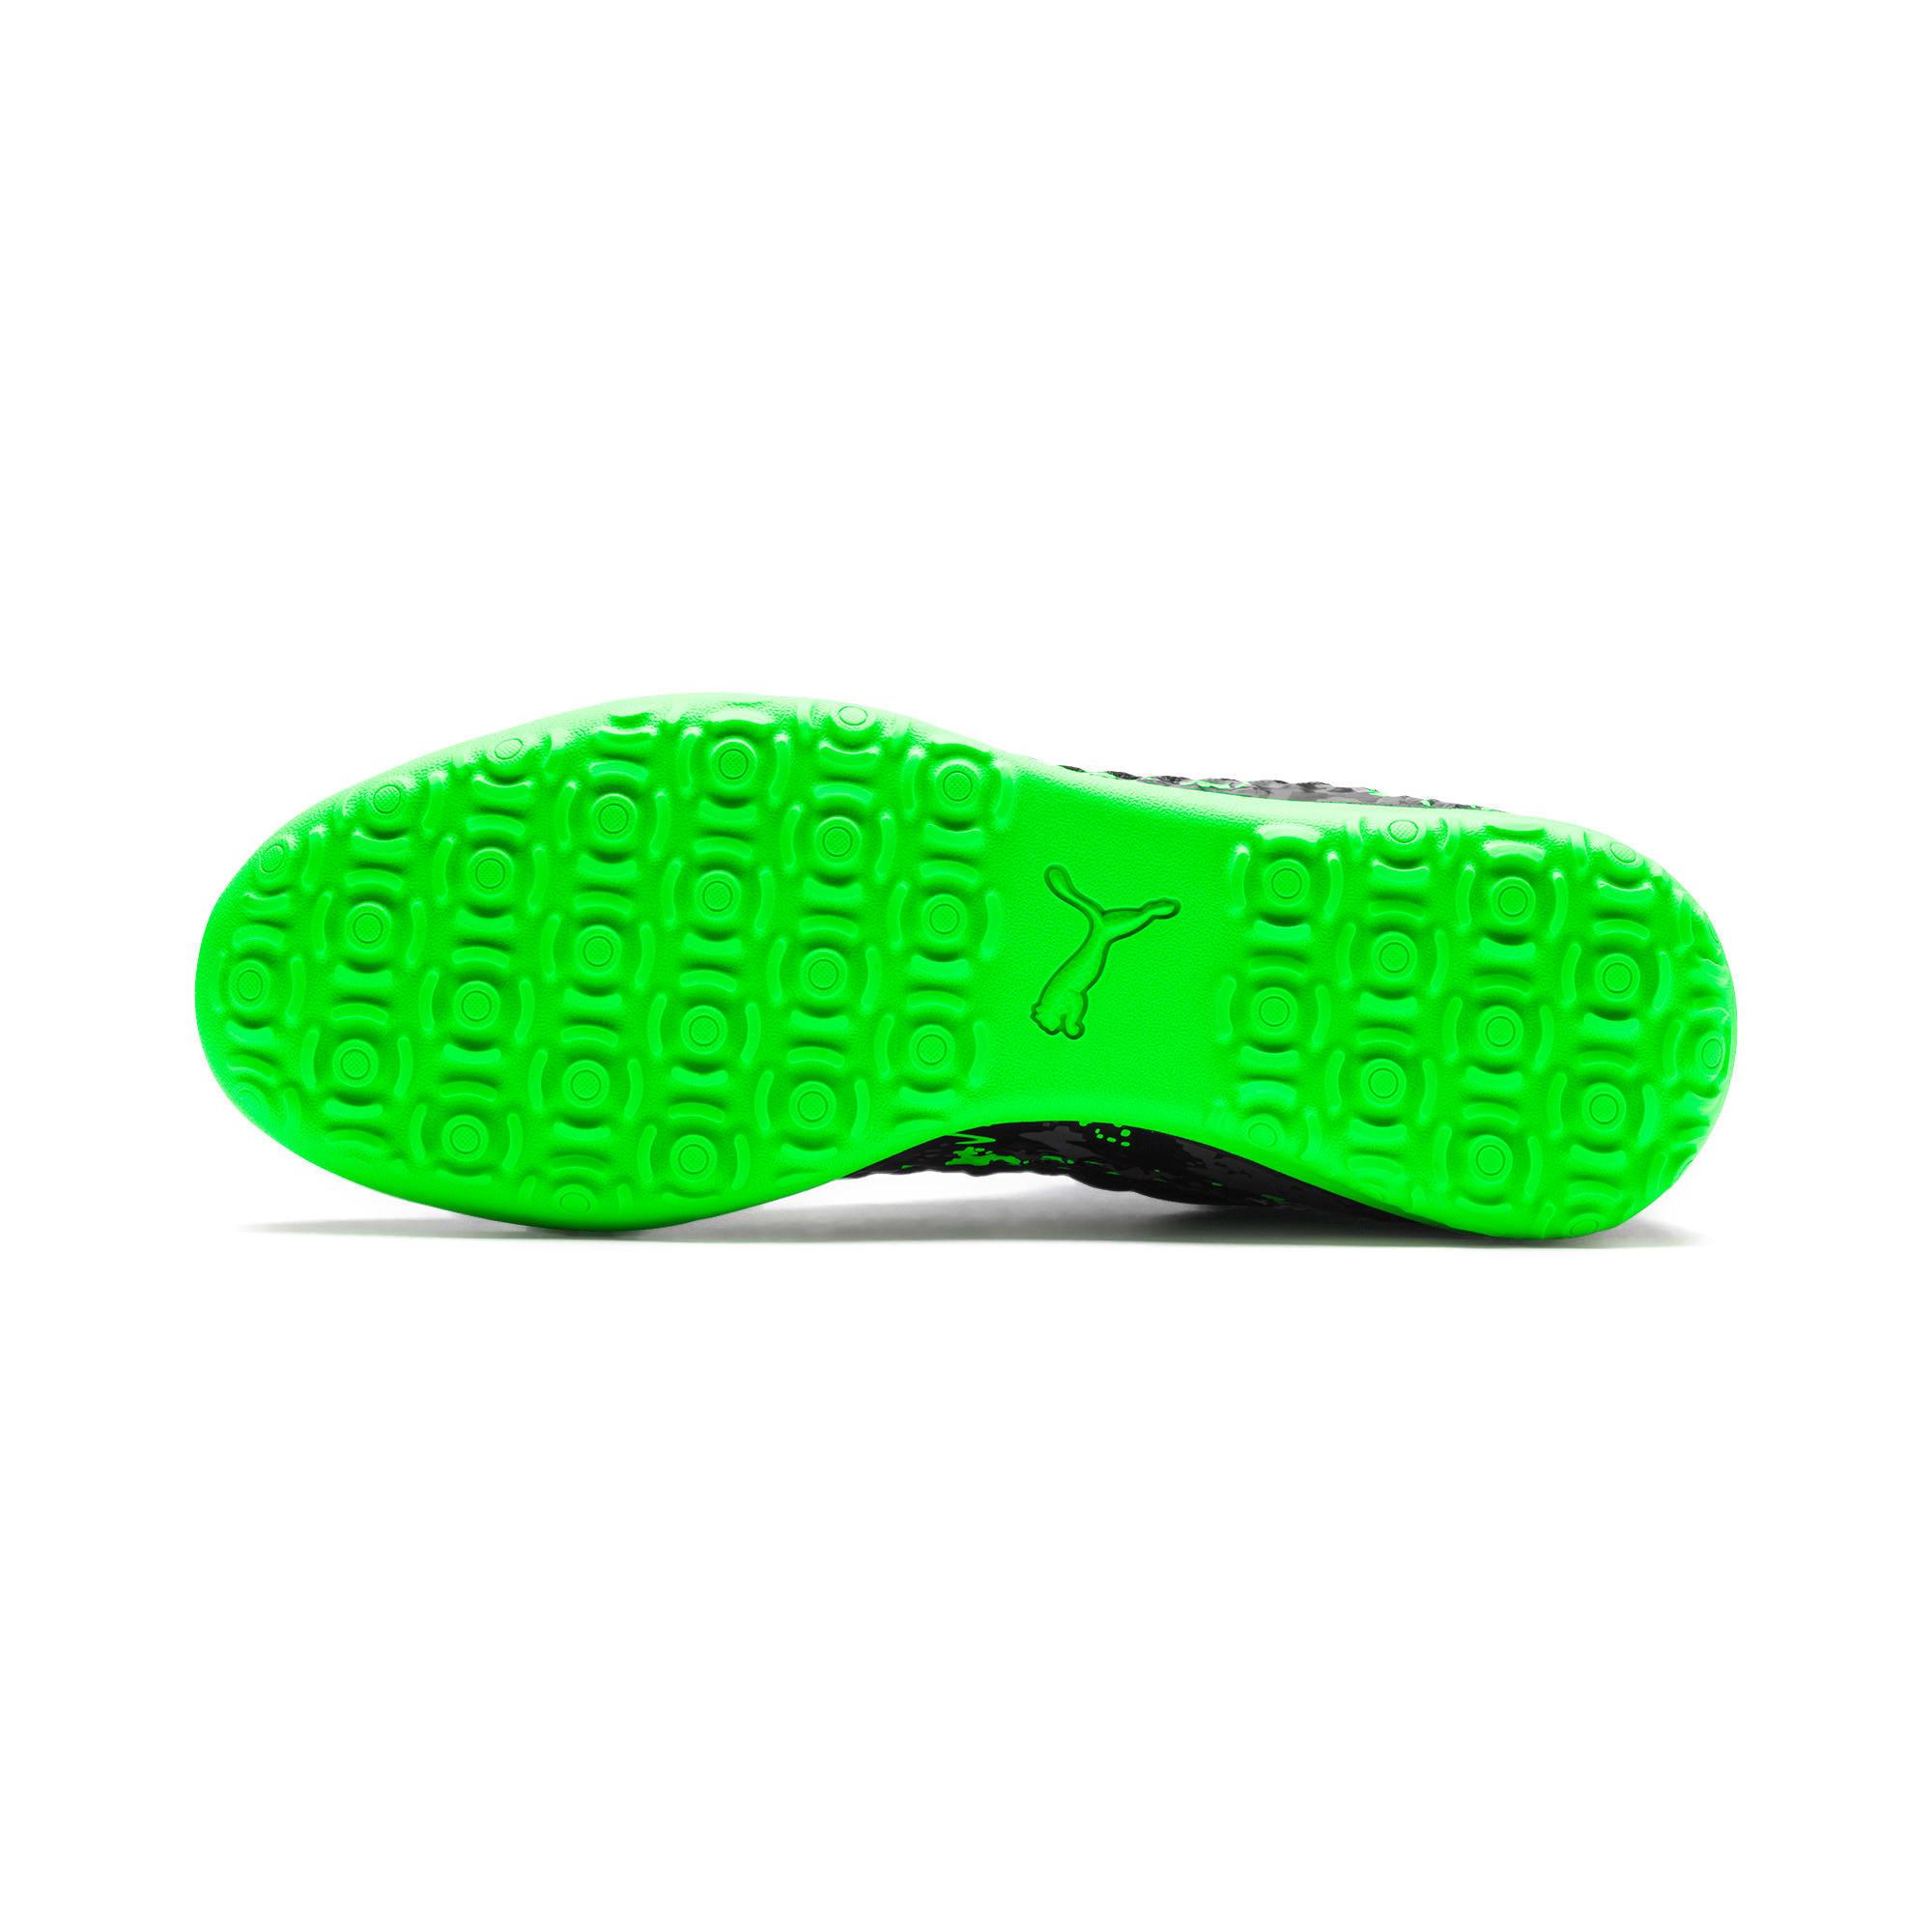 Thumbnail 4 of FUTURE 19.3 NETFIT TT Men's Soccer Shoes, Black-Gray-Green Gecko, medium